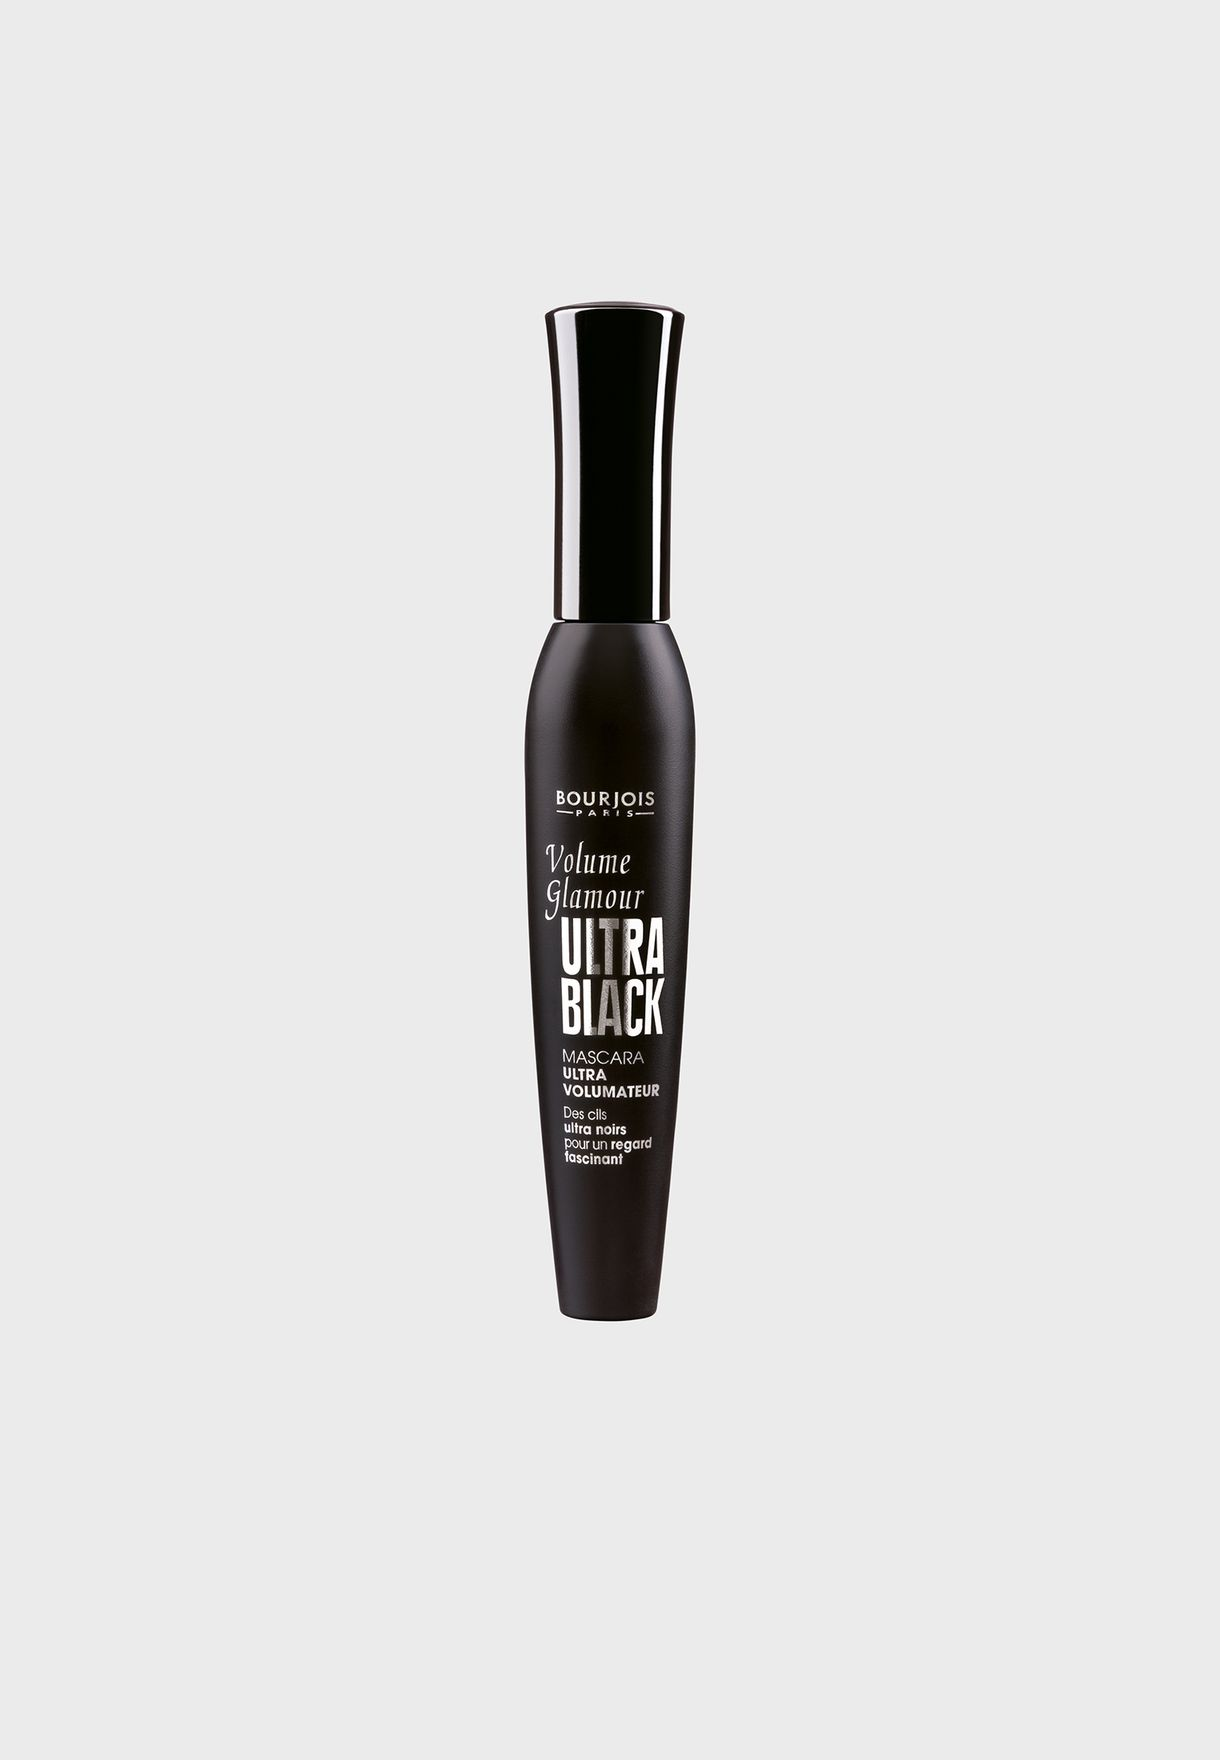 Volume Glamour Ultra Mascara Ultra Black